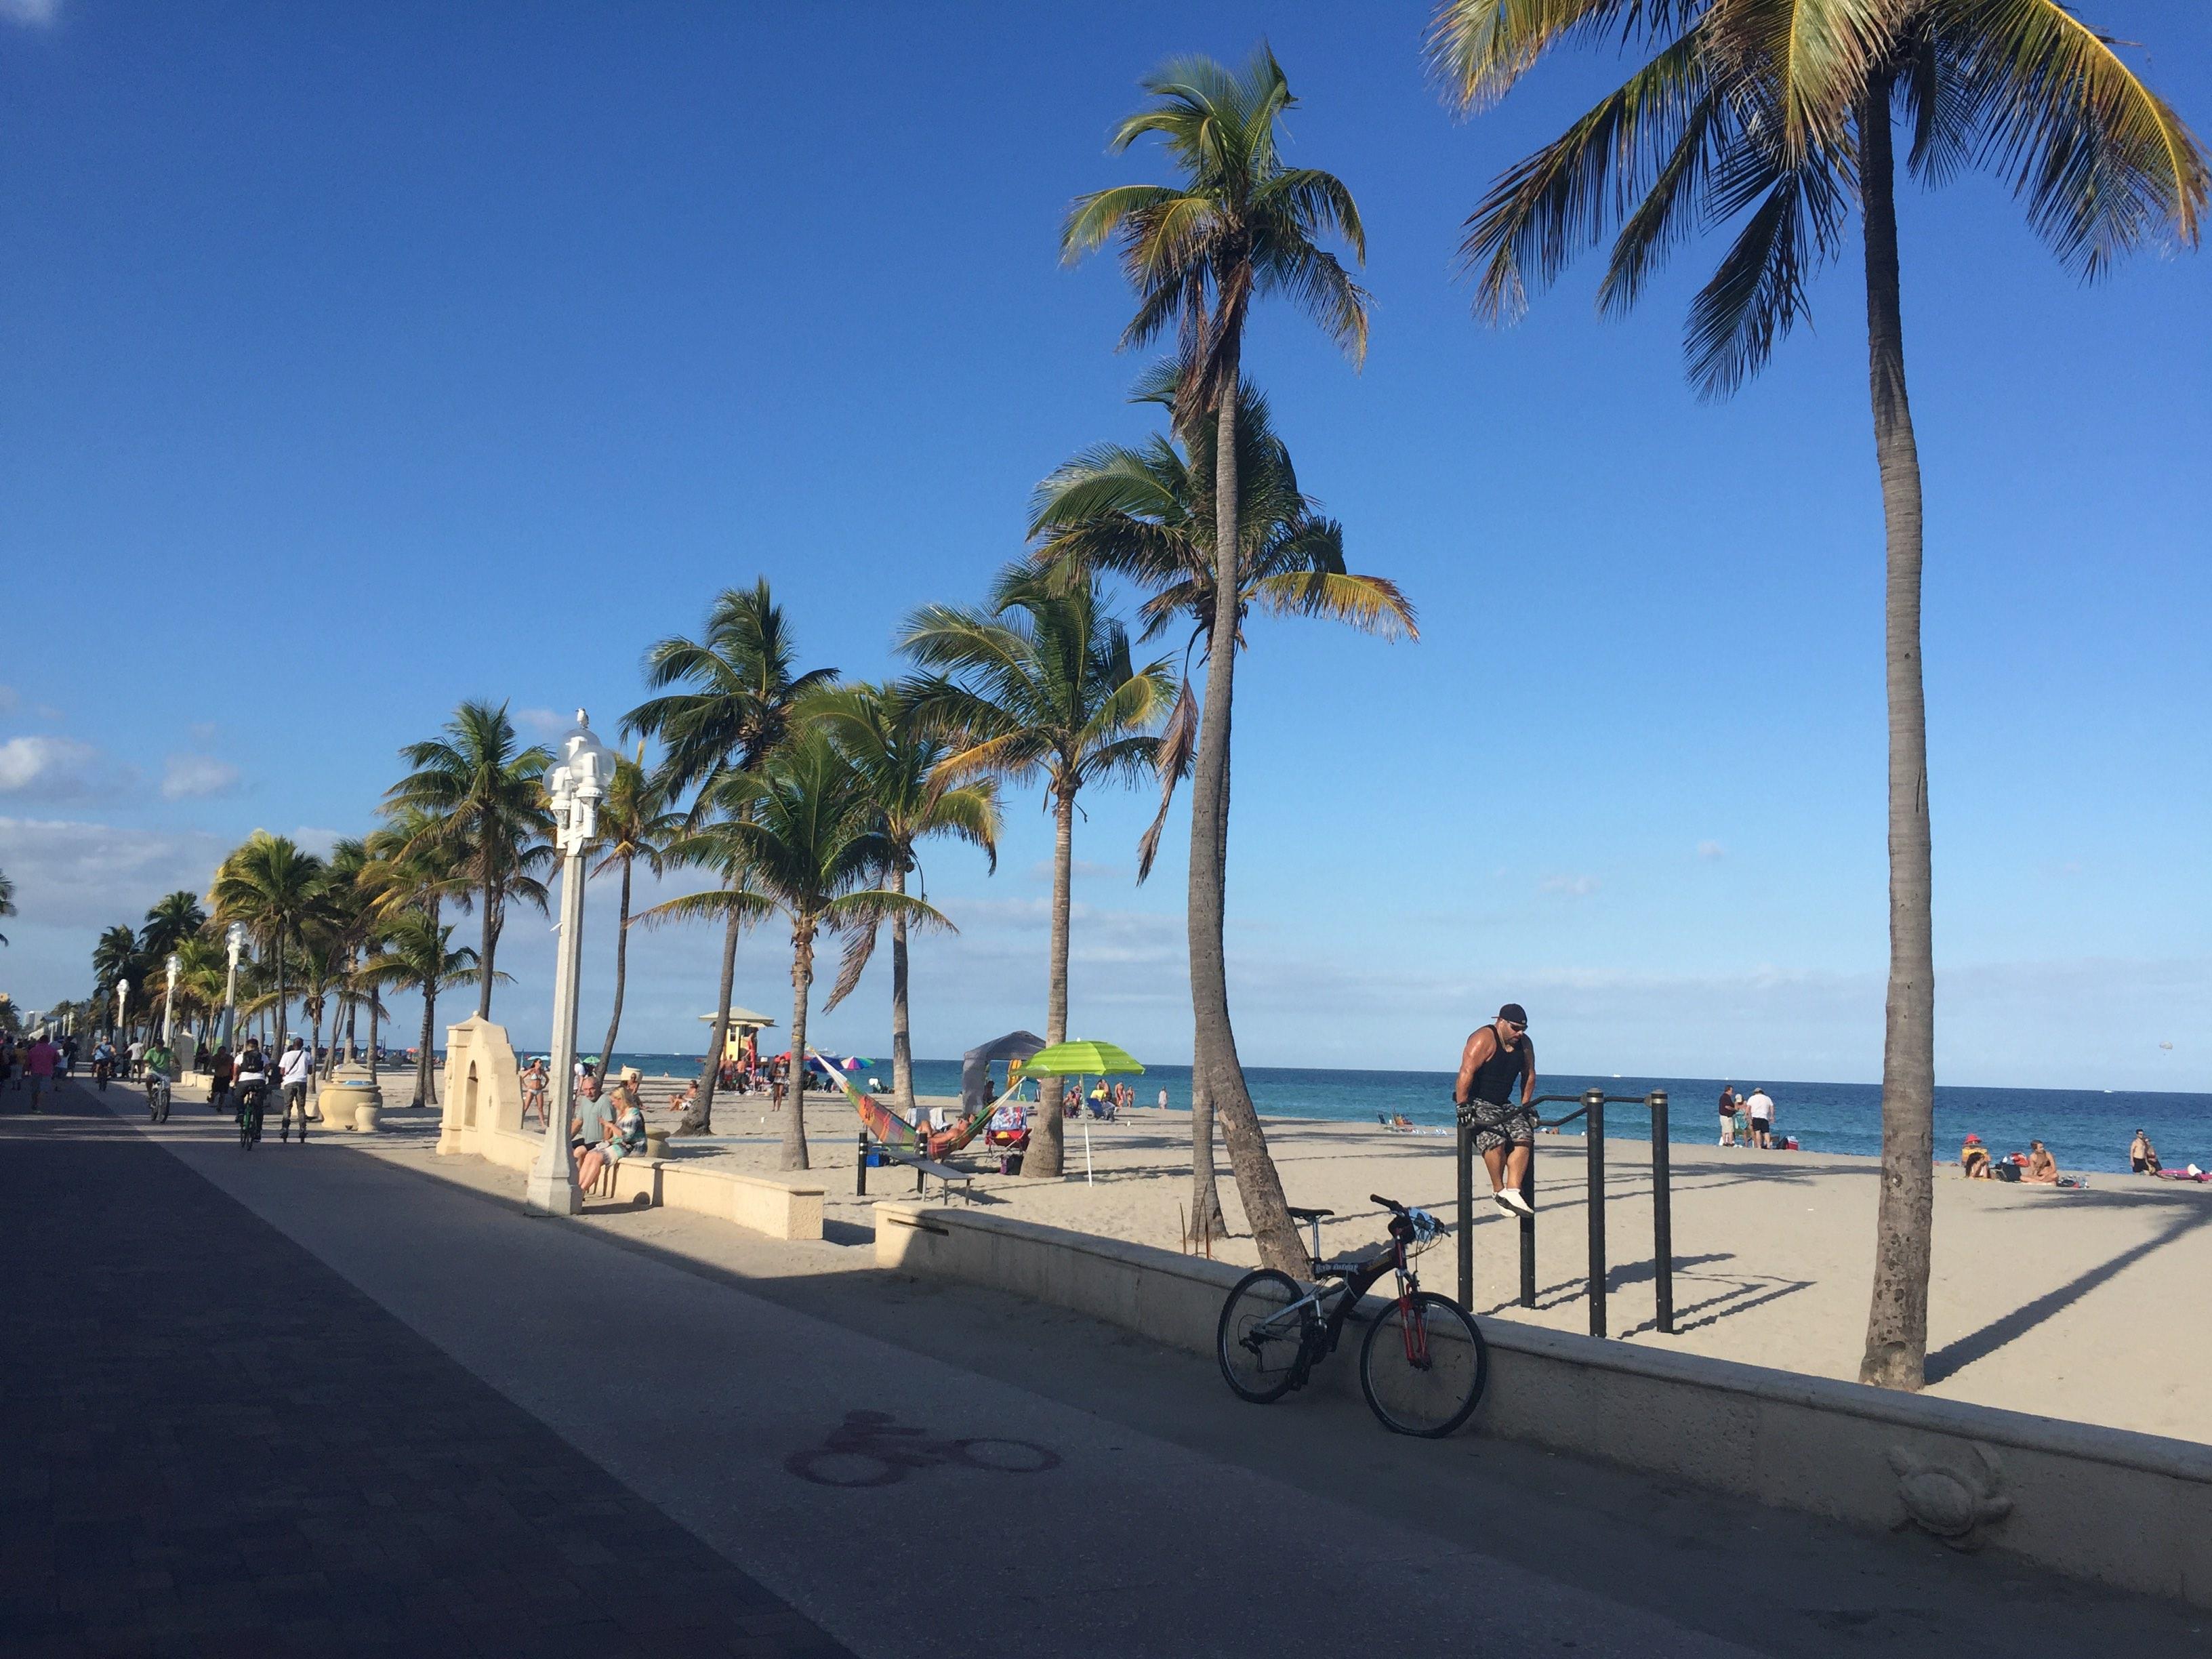 Vol A/R Nantes (NTE) - Miami (MIA) du 24.02.20  au 09.03.20 (boursedesvols.com)